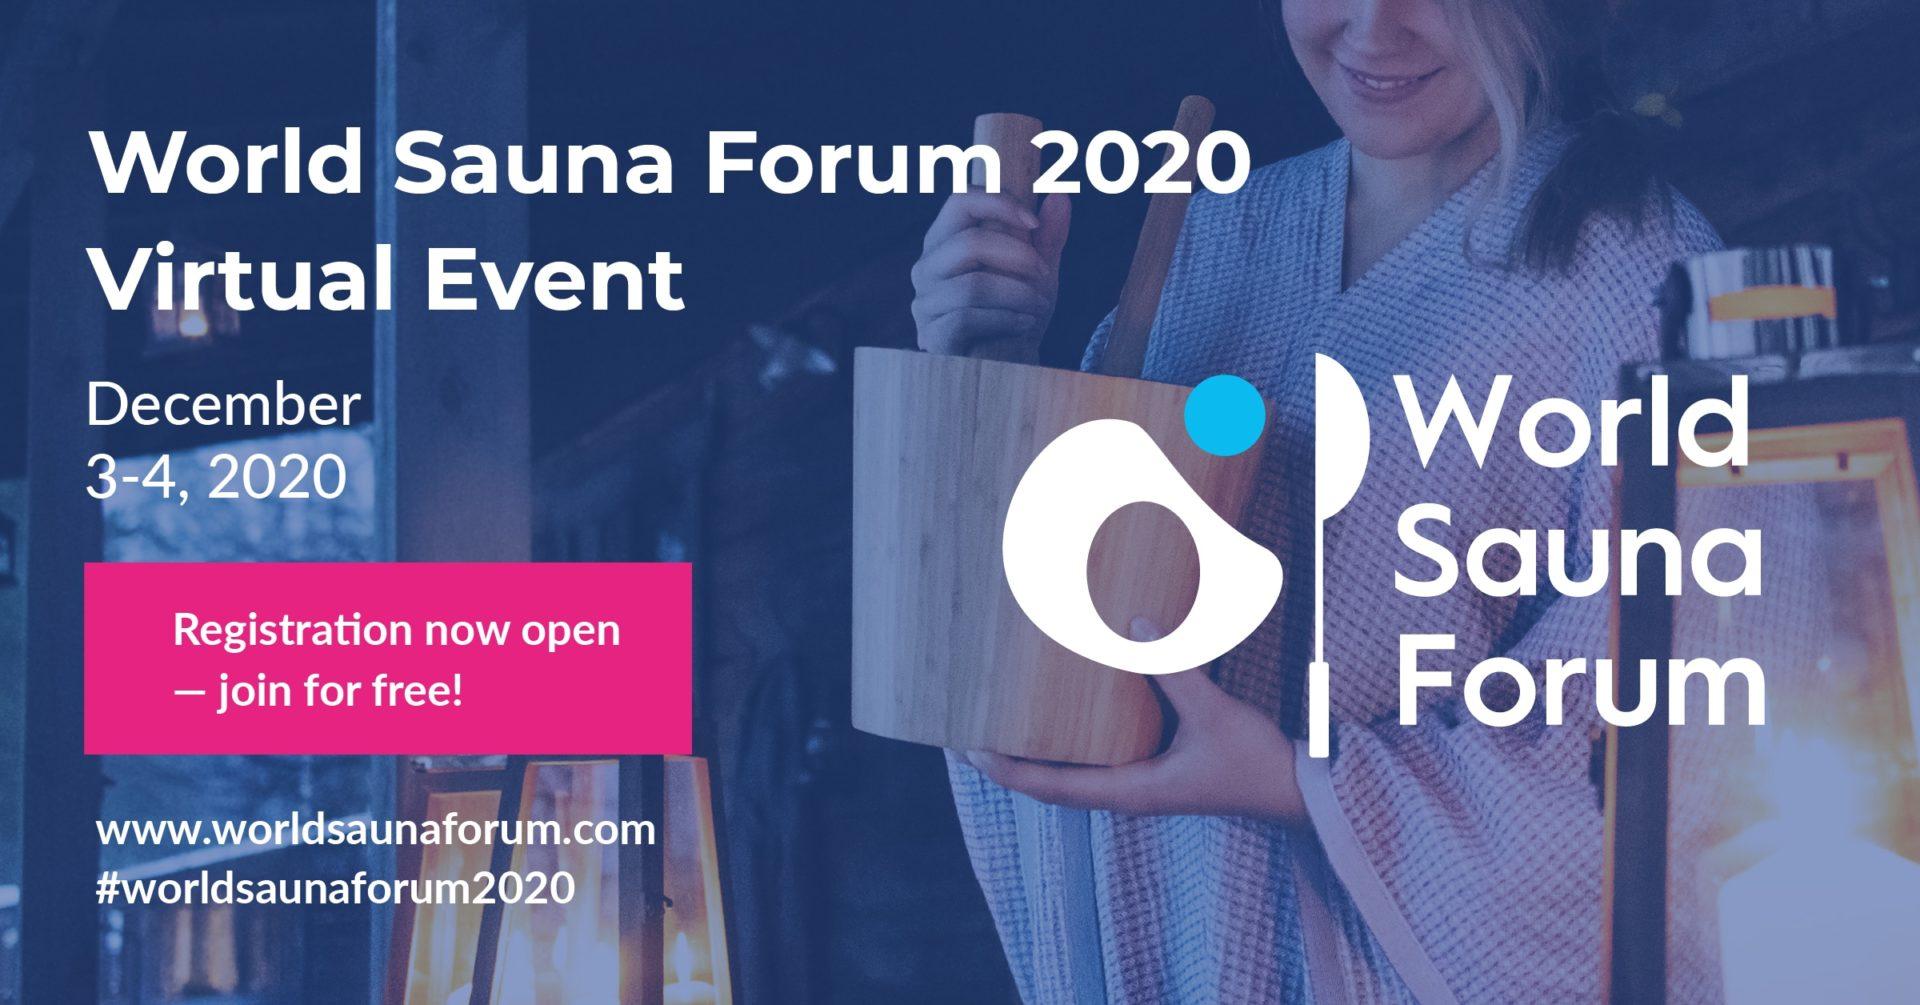 World Sauna Forum Virtual Event